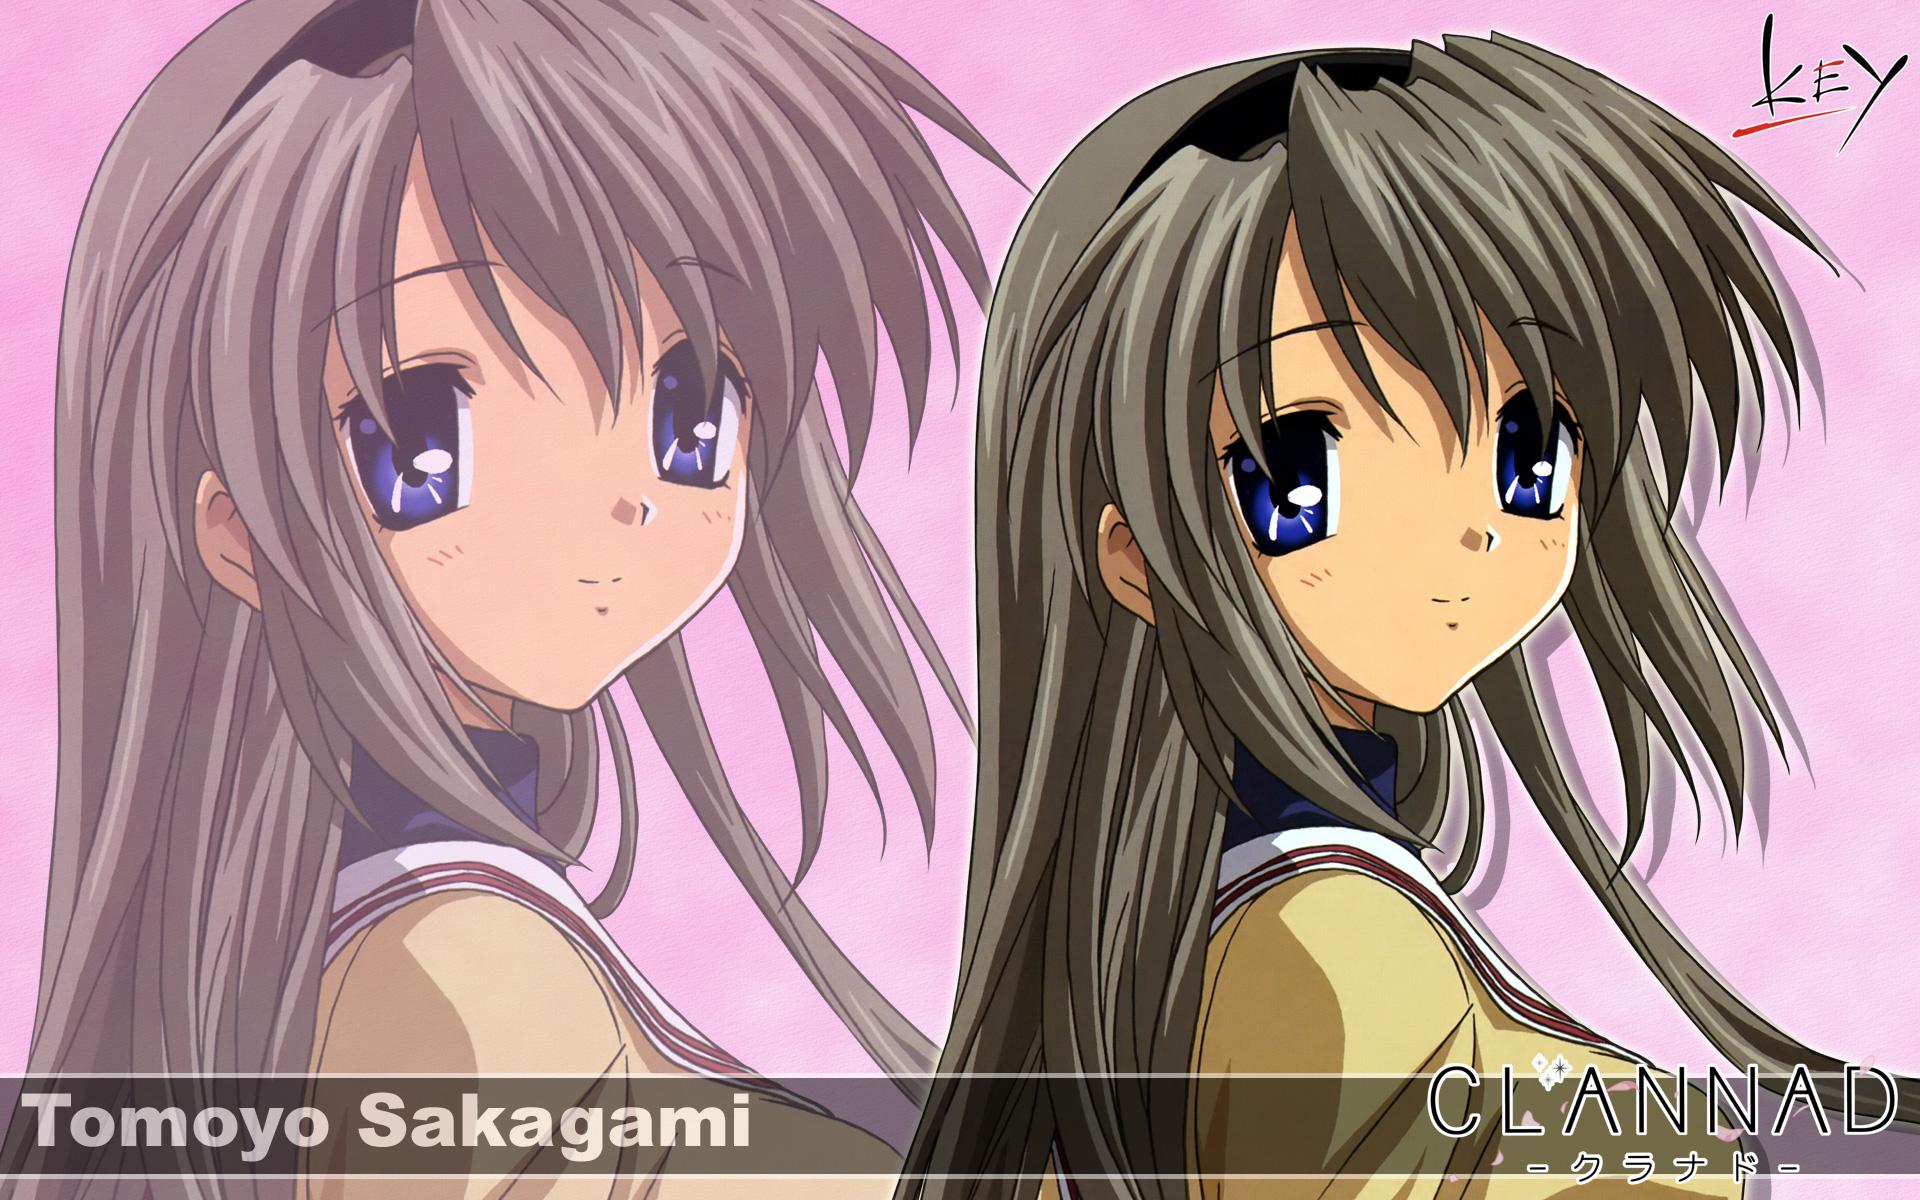 blue_eyes brown_hair clannad gray_hair headband key logo long_hair sakagami_tomoyo seifuku zoom_layer